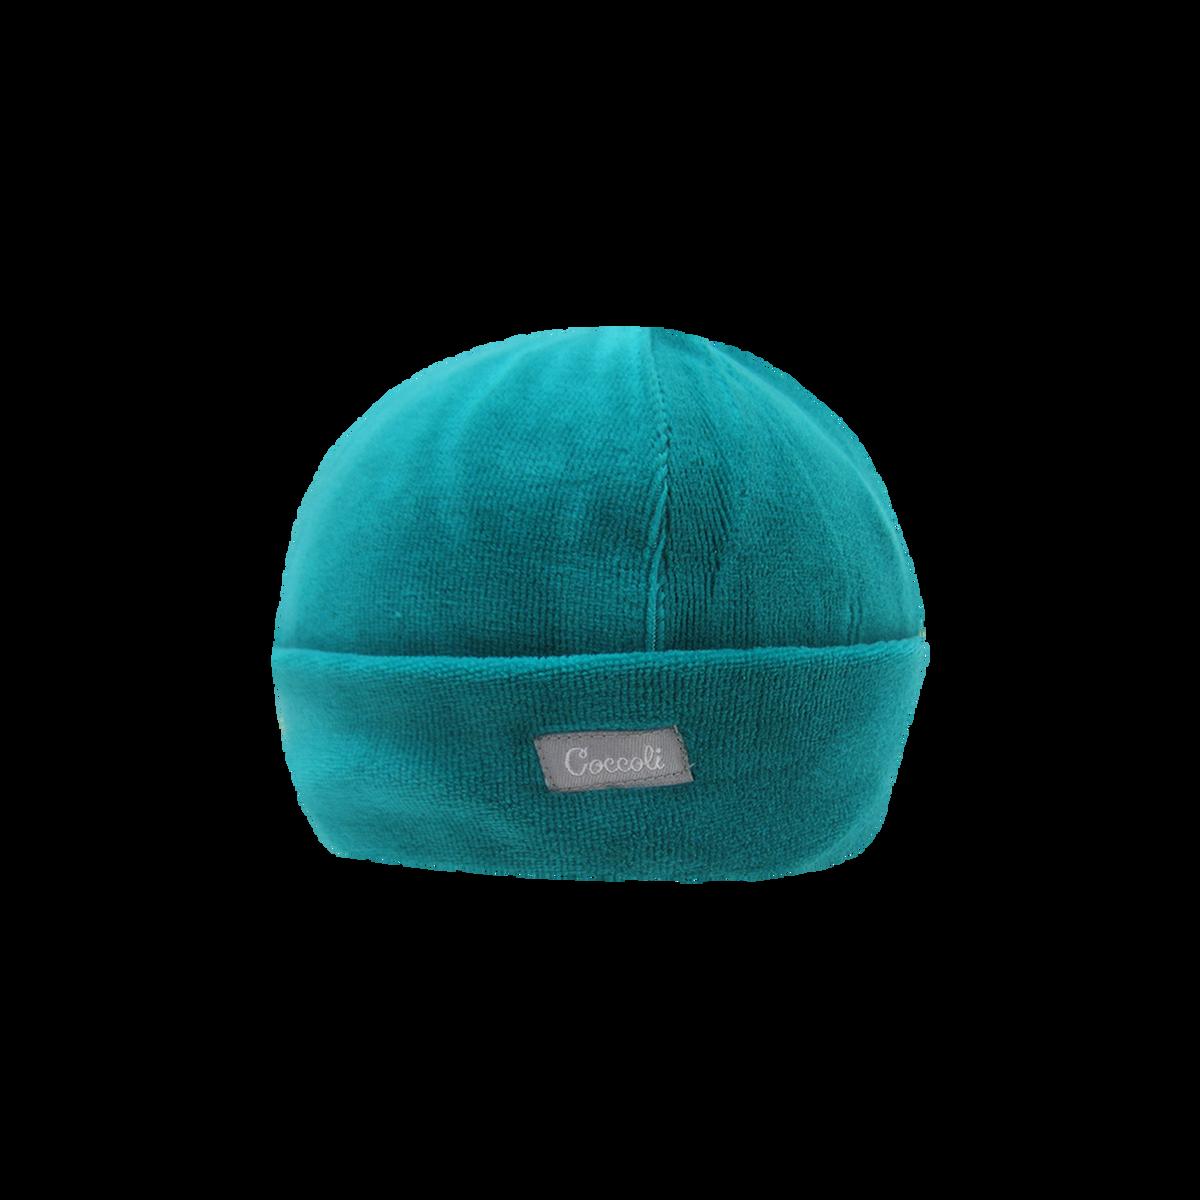 Coccoli Velour | Cap | N/1 - 9/12m | B3933-536